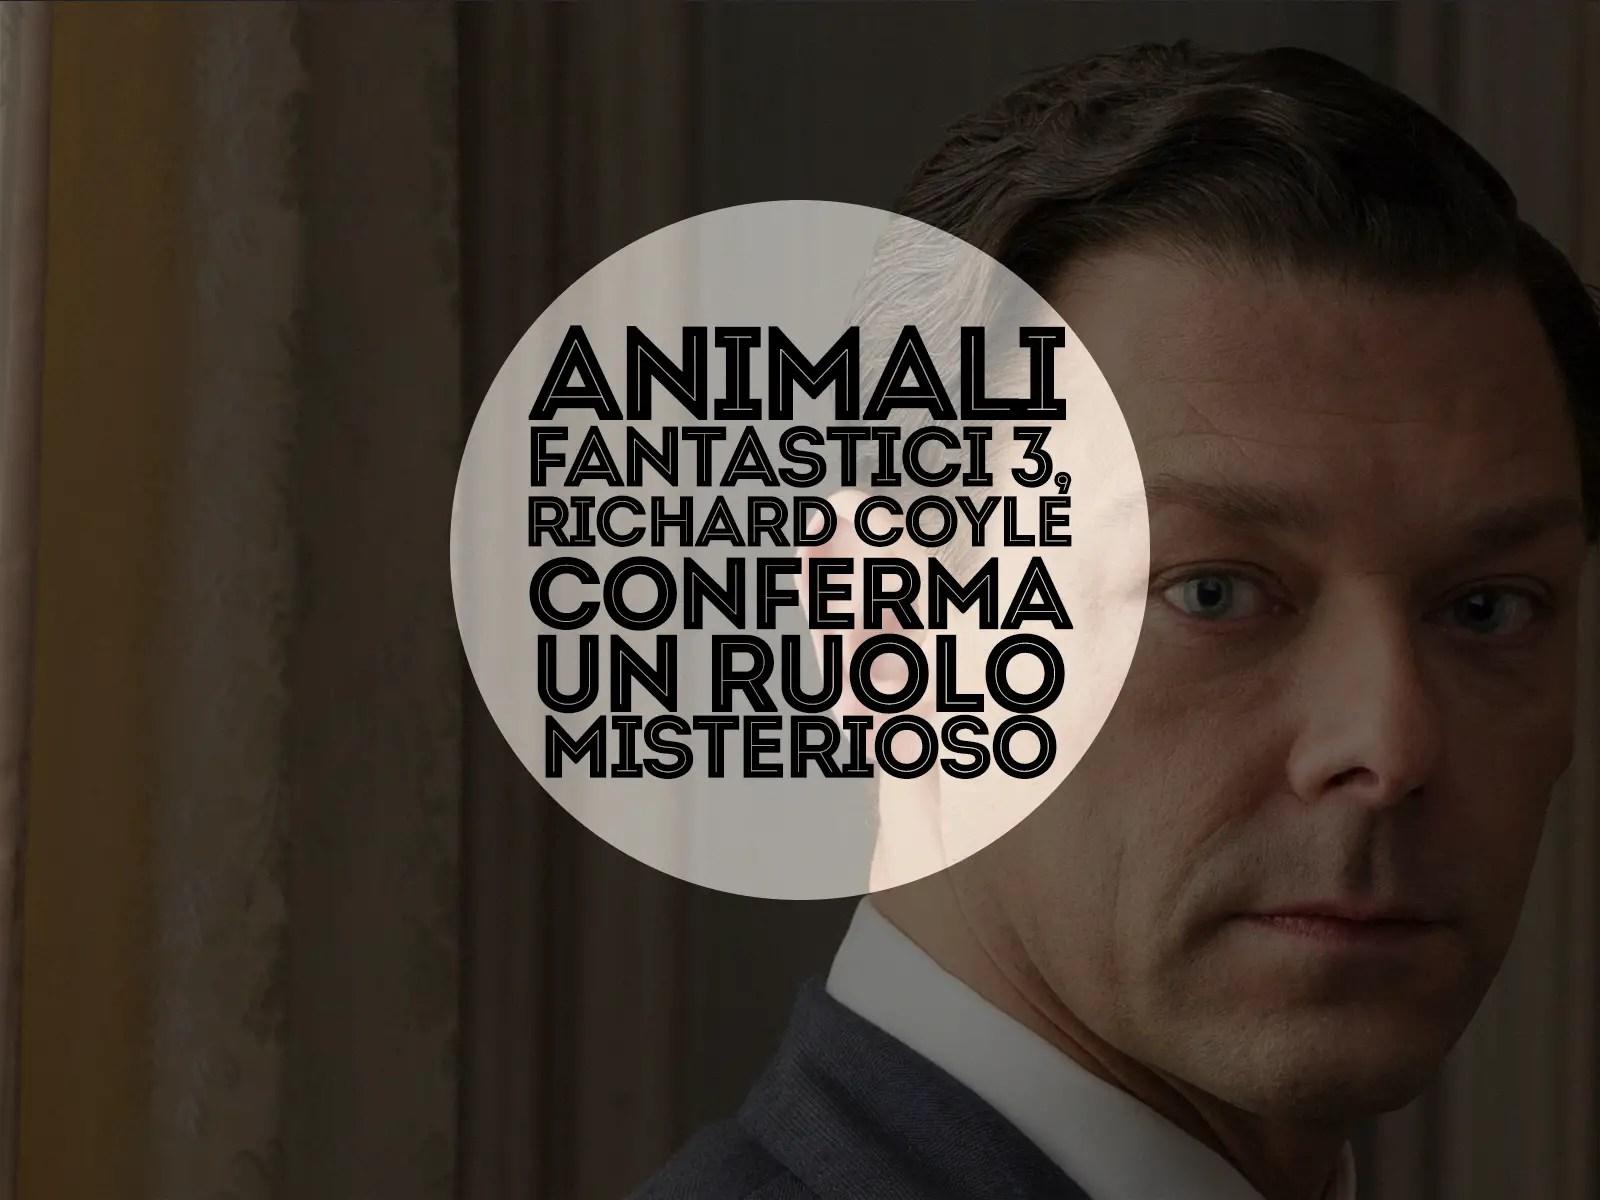 Animali Fantastici 3, Richard Coyle conferma un ruolo misterioso